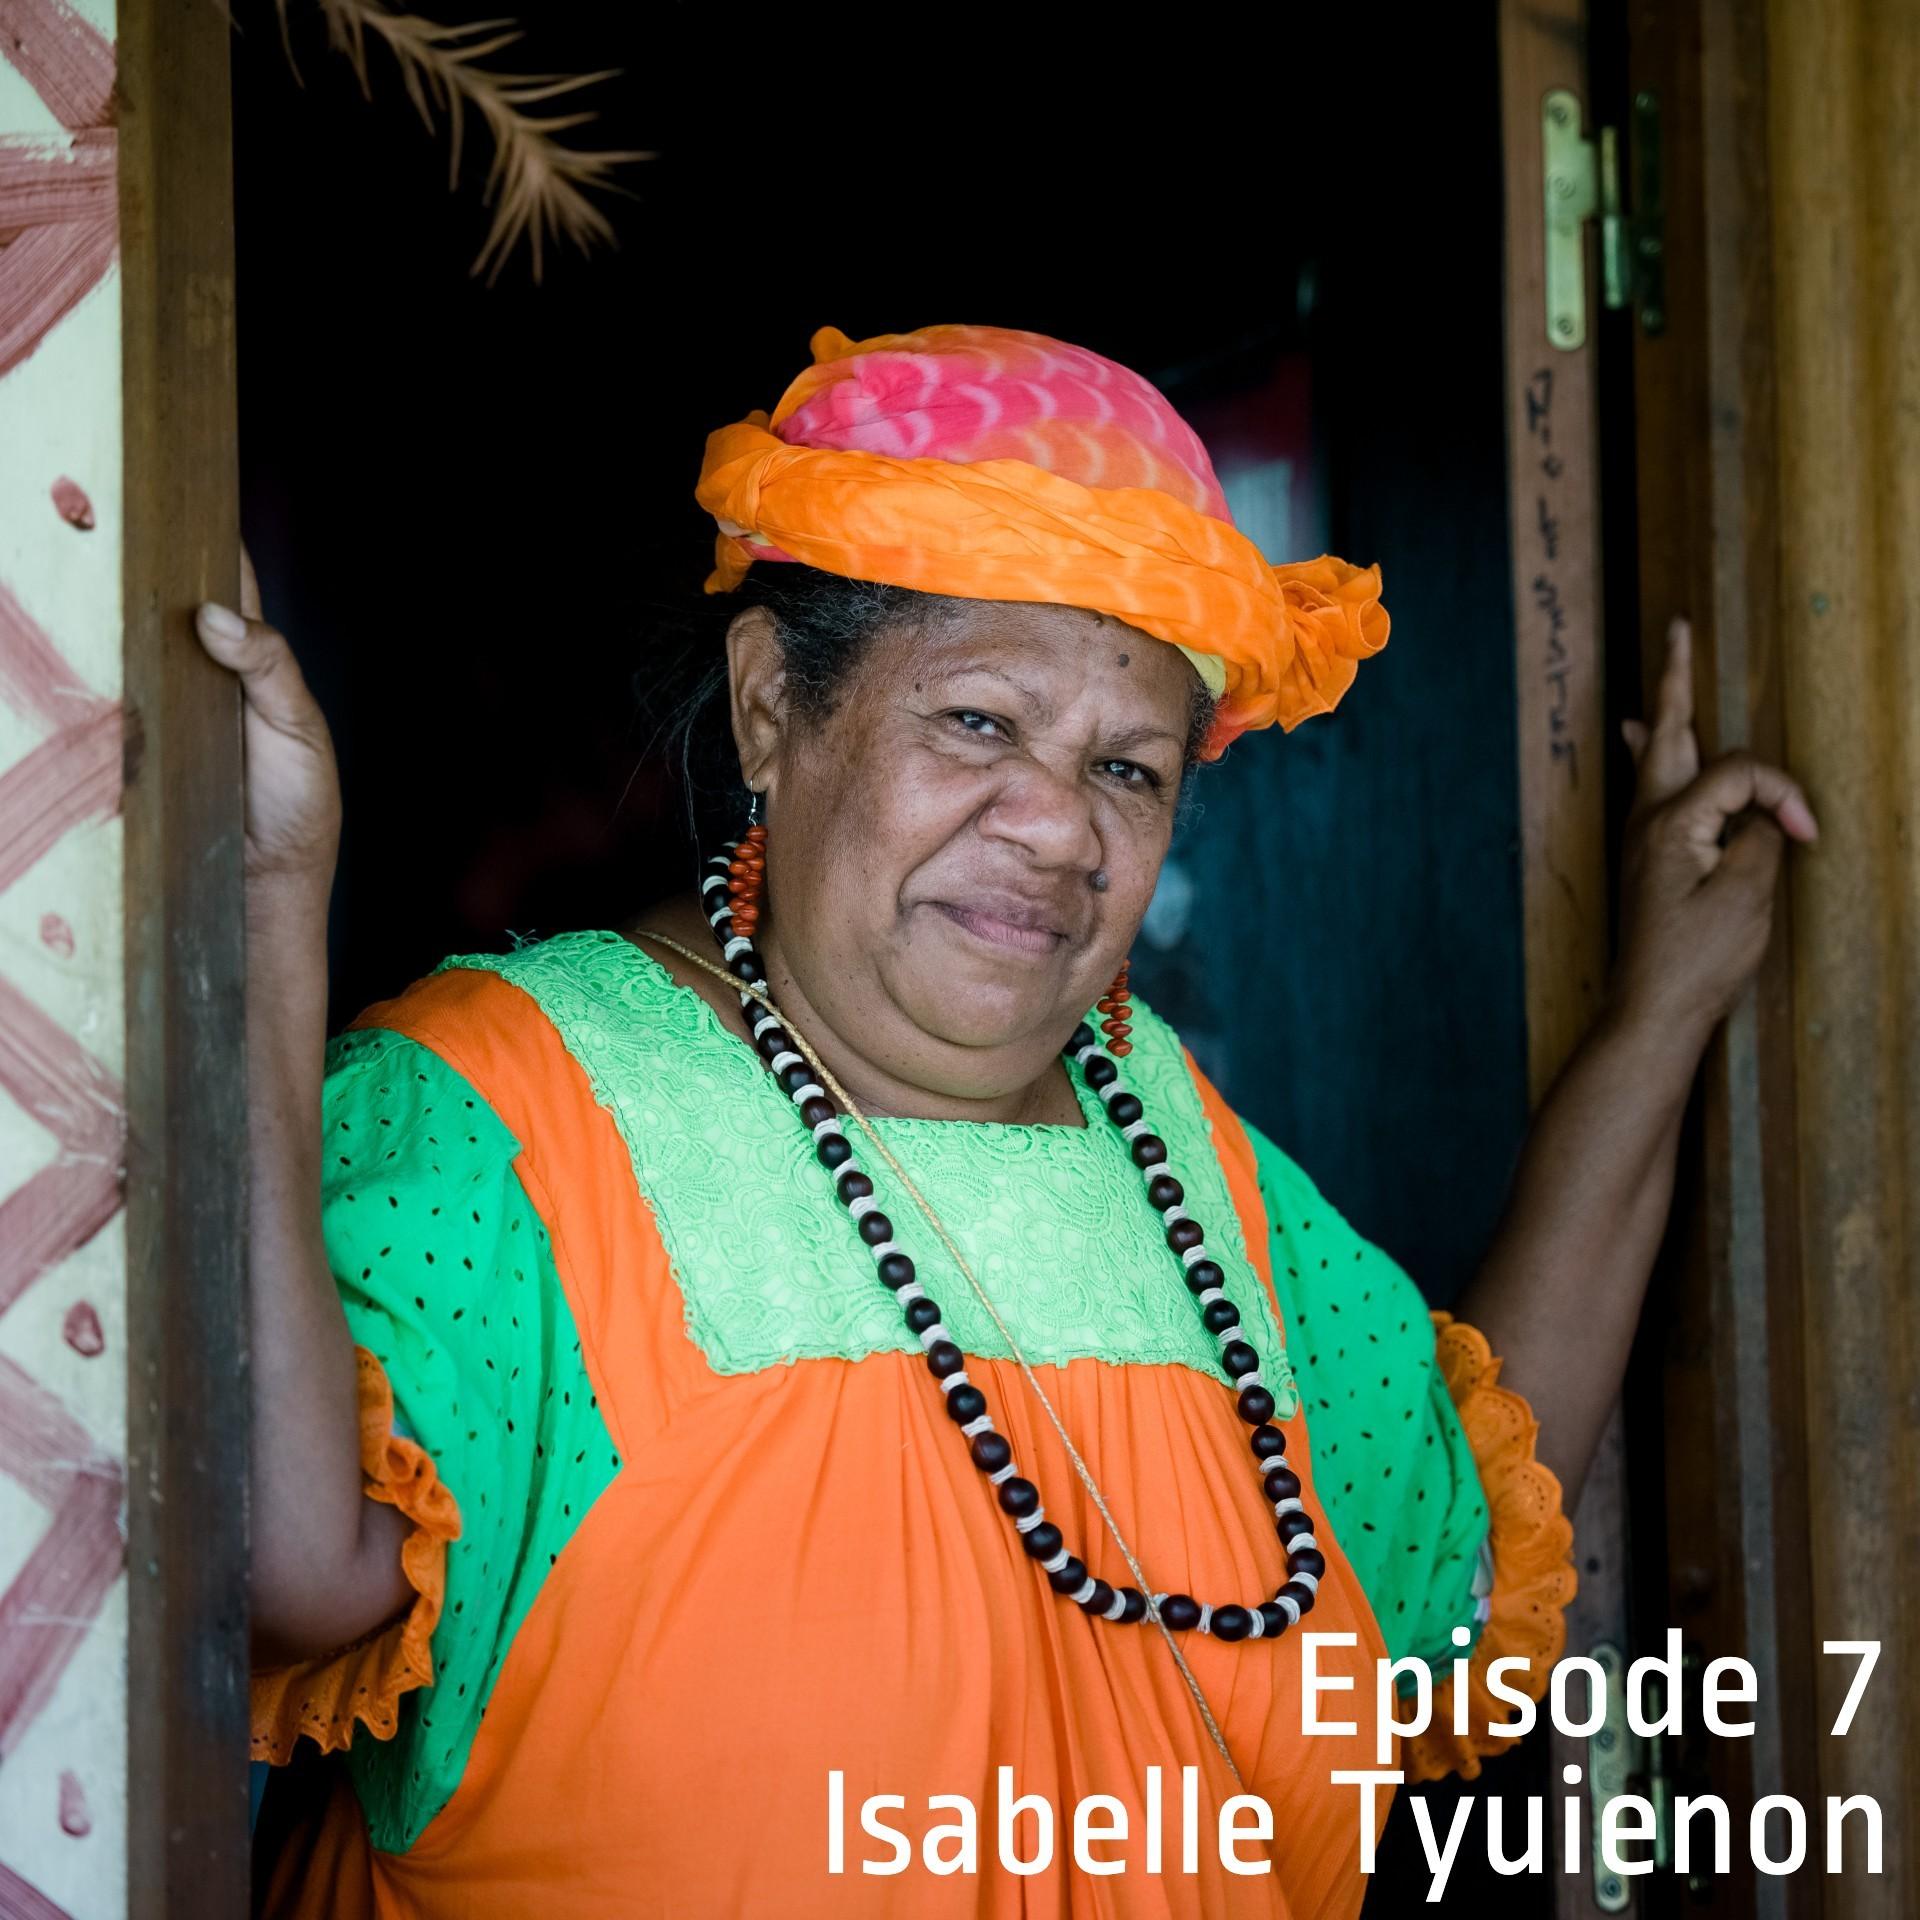 Episode 7 - Isabelle Tyuienon